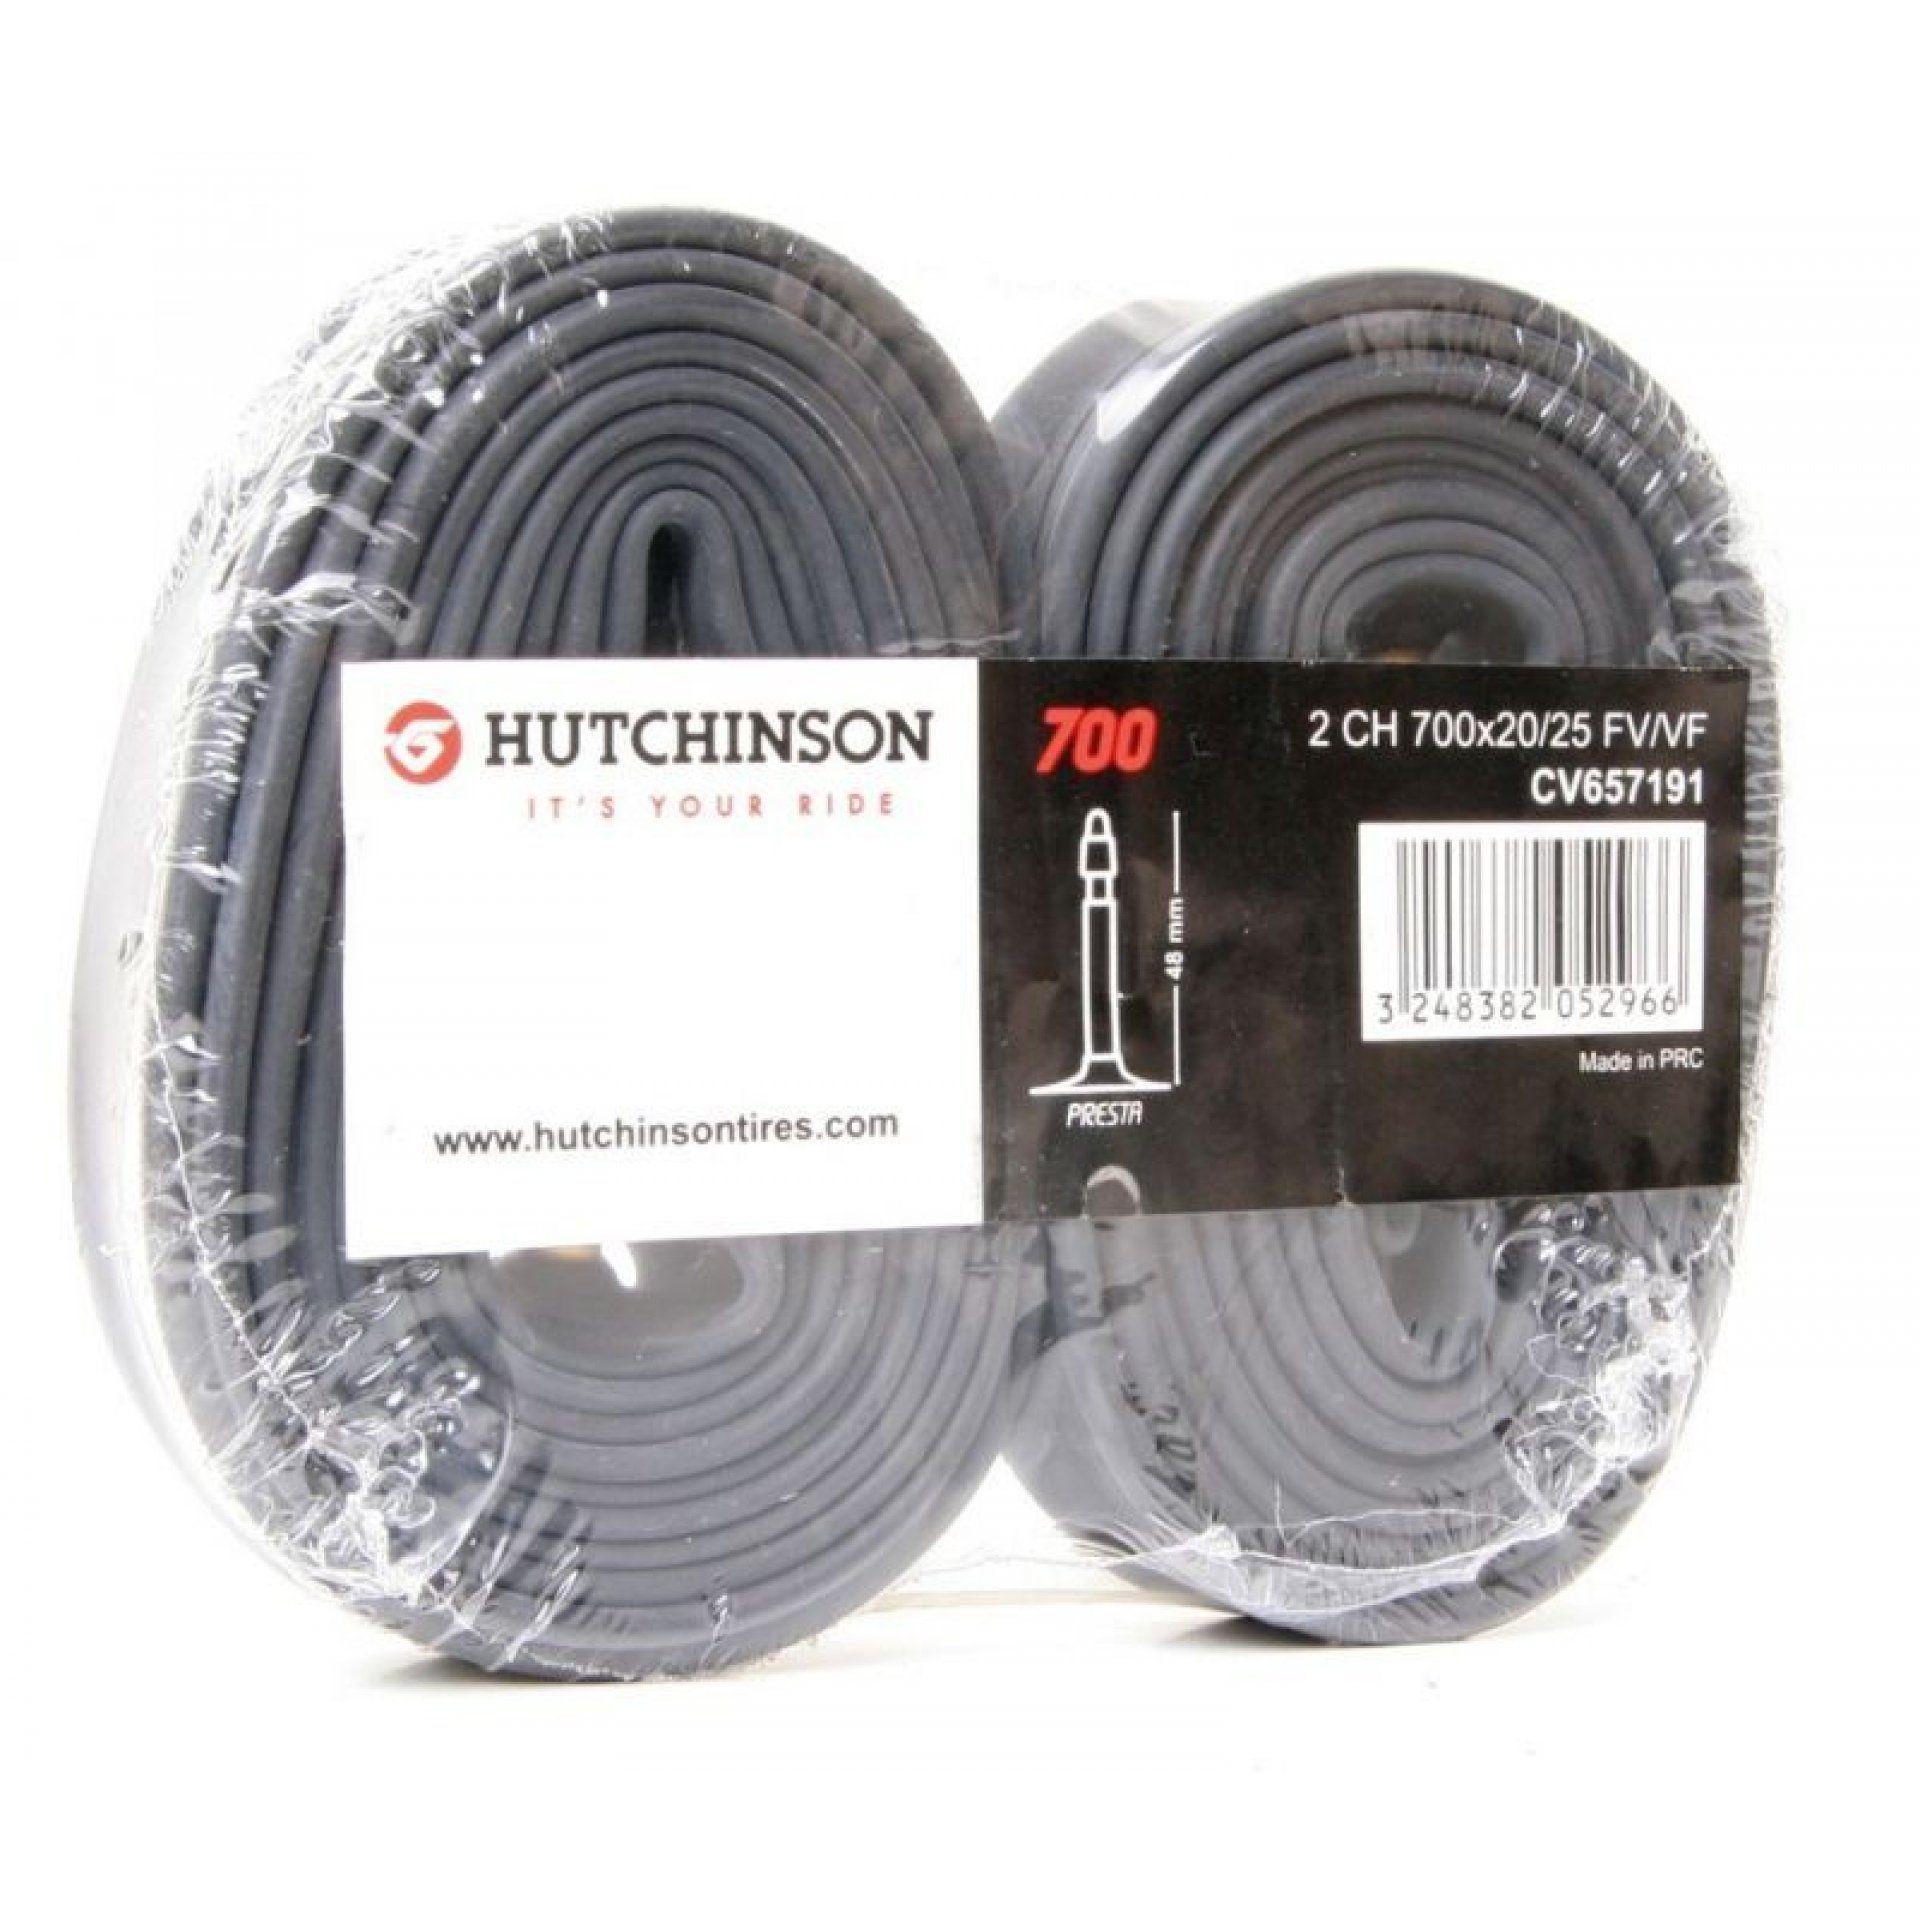 DĘTKA ROWEROWA HUTCHINSON BICYCLE TUBE 27,5 SCHRADER 32 MM 1